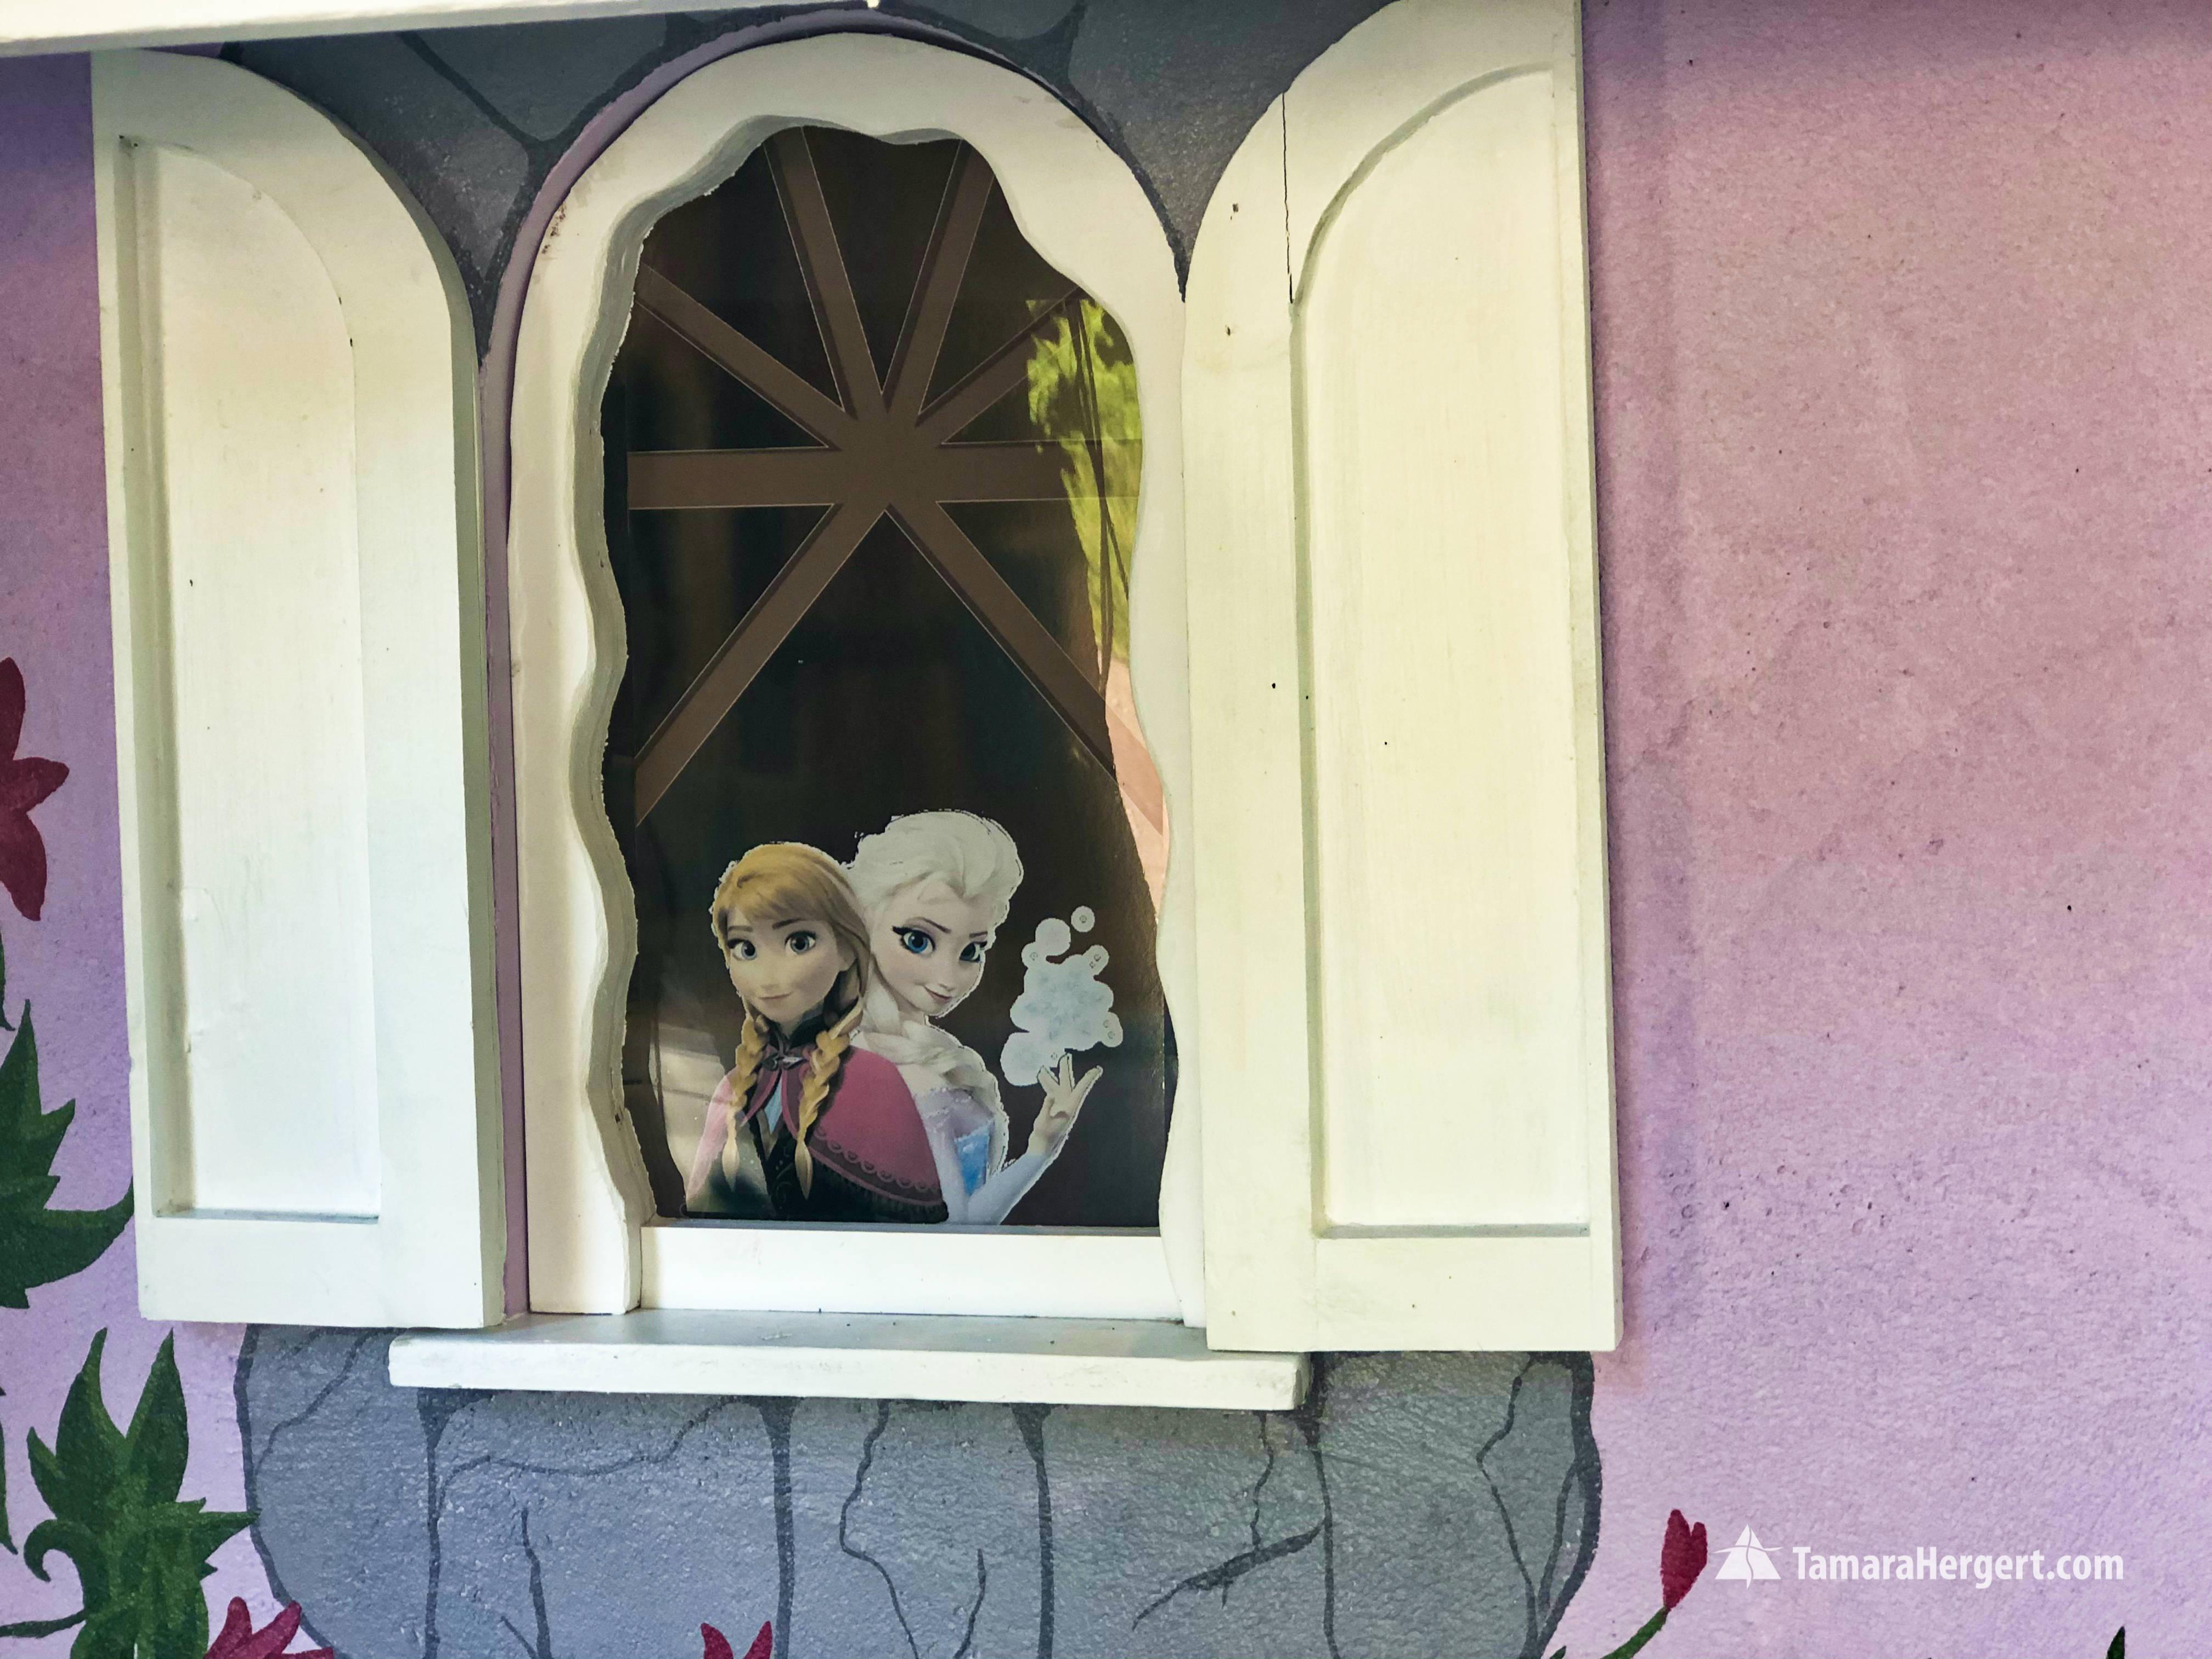 Fairy tale house mural by Tamara Hergert